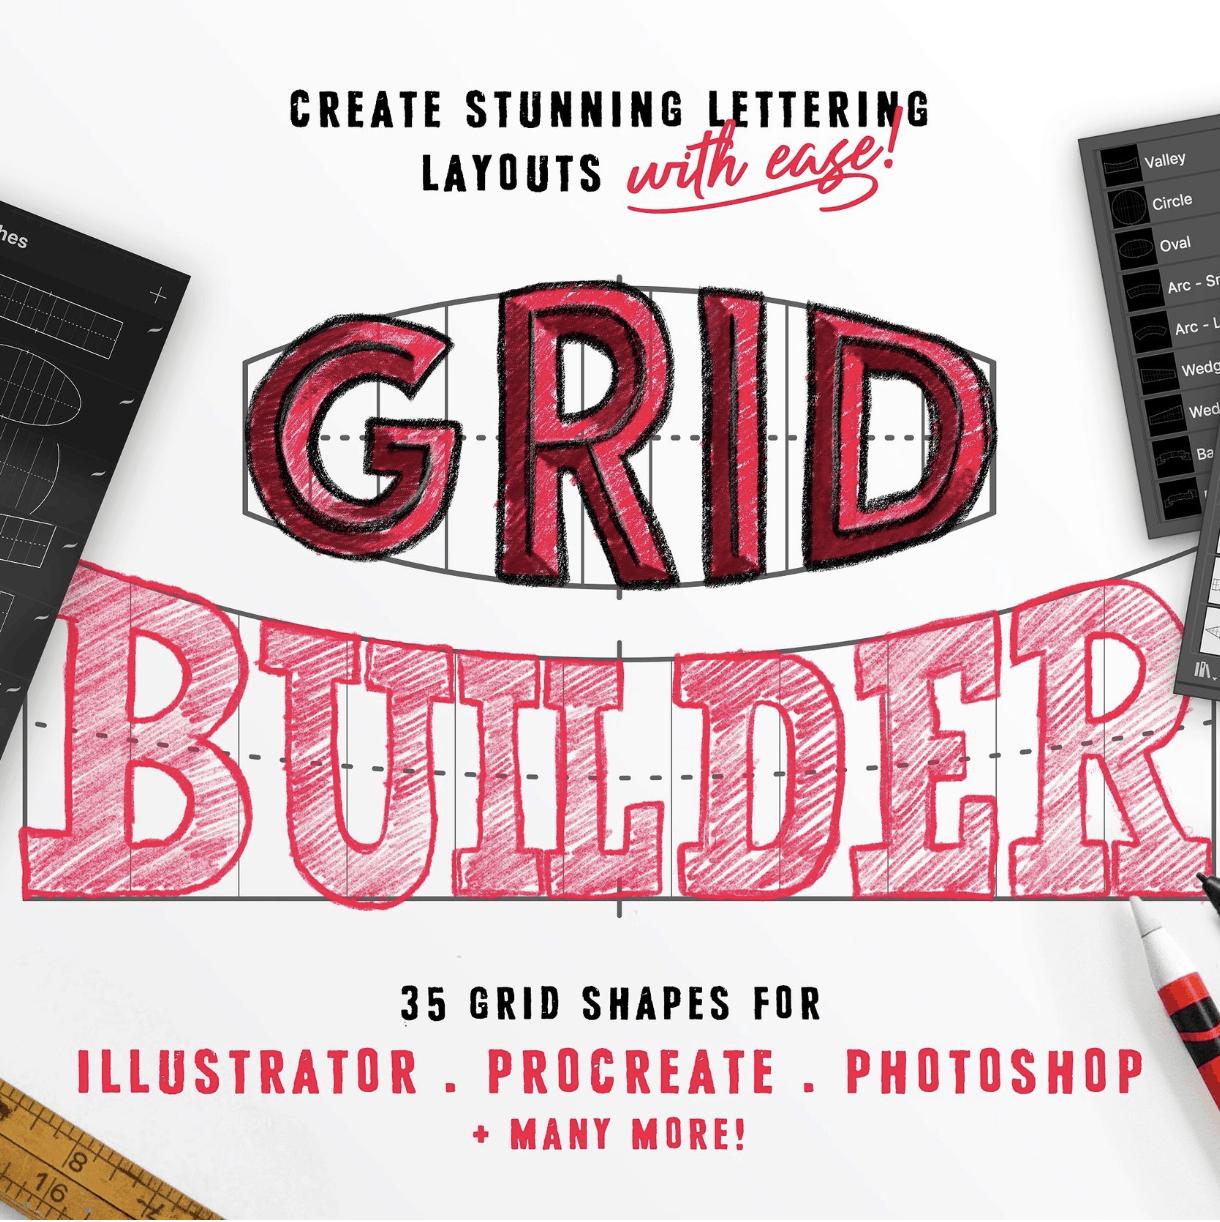 stefan-kunz-grid-builder